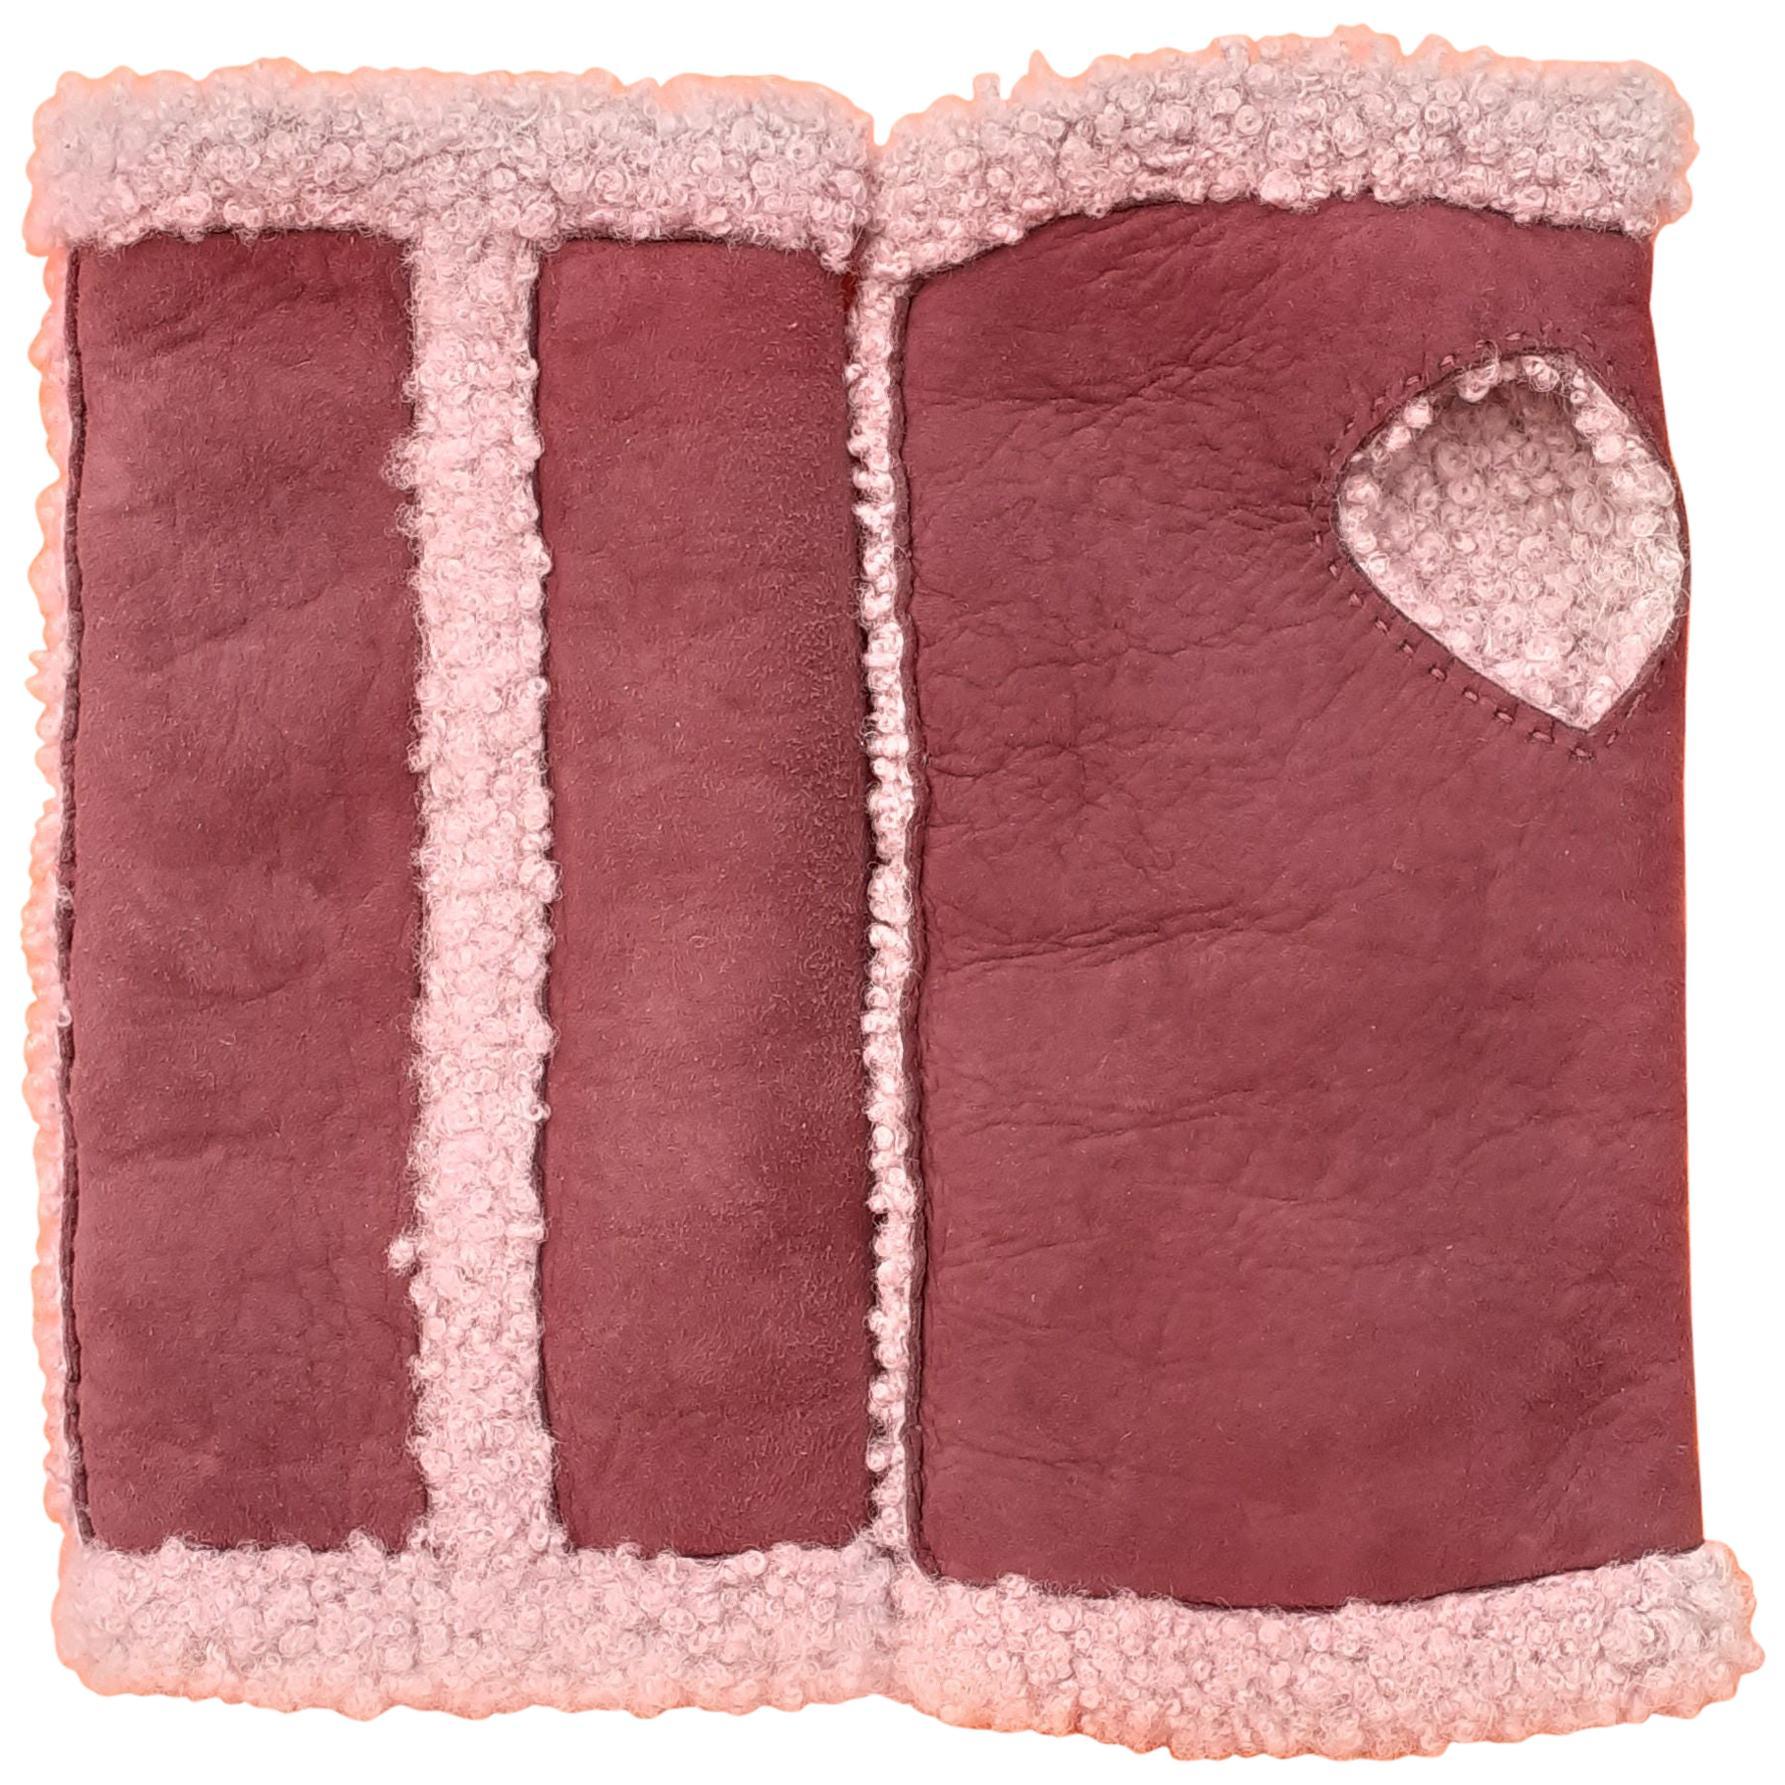 Hermès Open Gloves Mittens Teddy Plush Shearling Leather Wool Purple Size 6.5